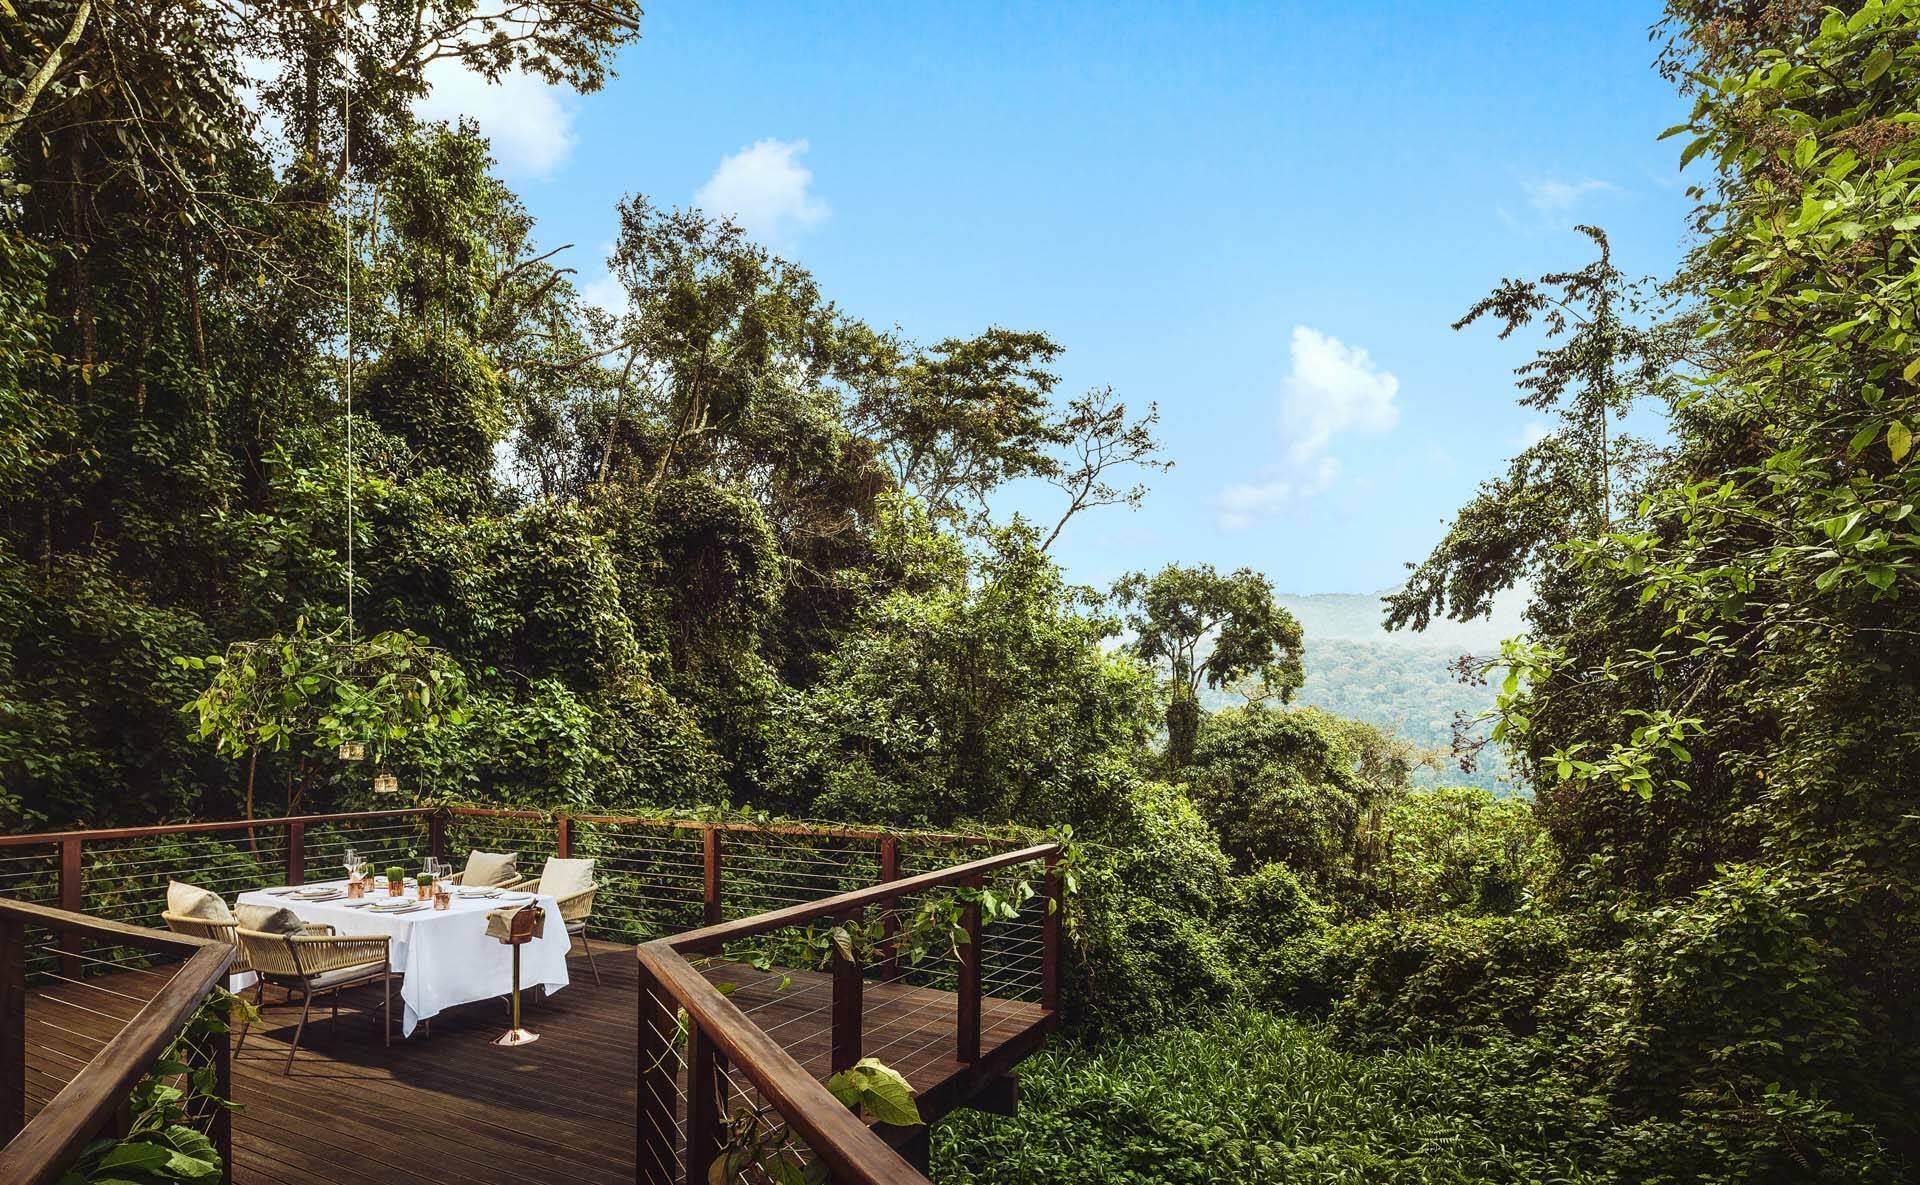 Rwanda OneandOnly NyungweHouse Diner Prive